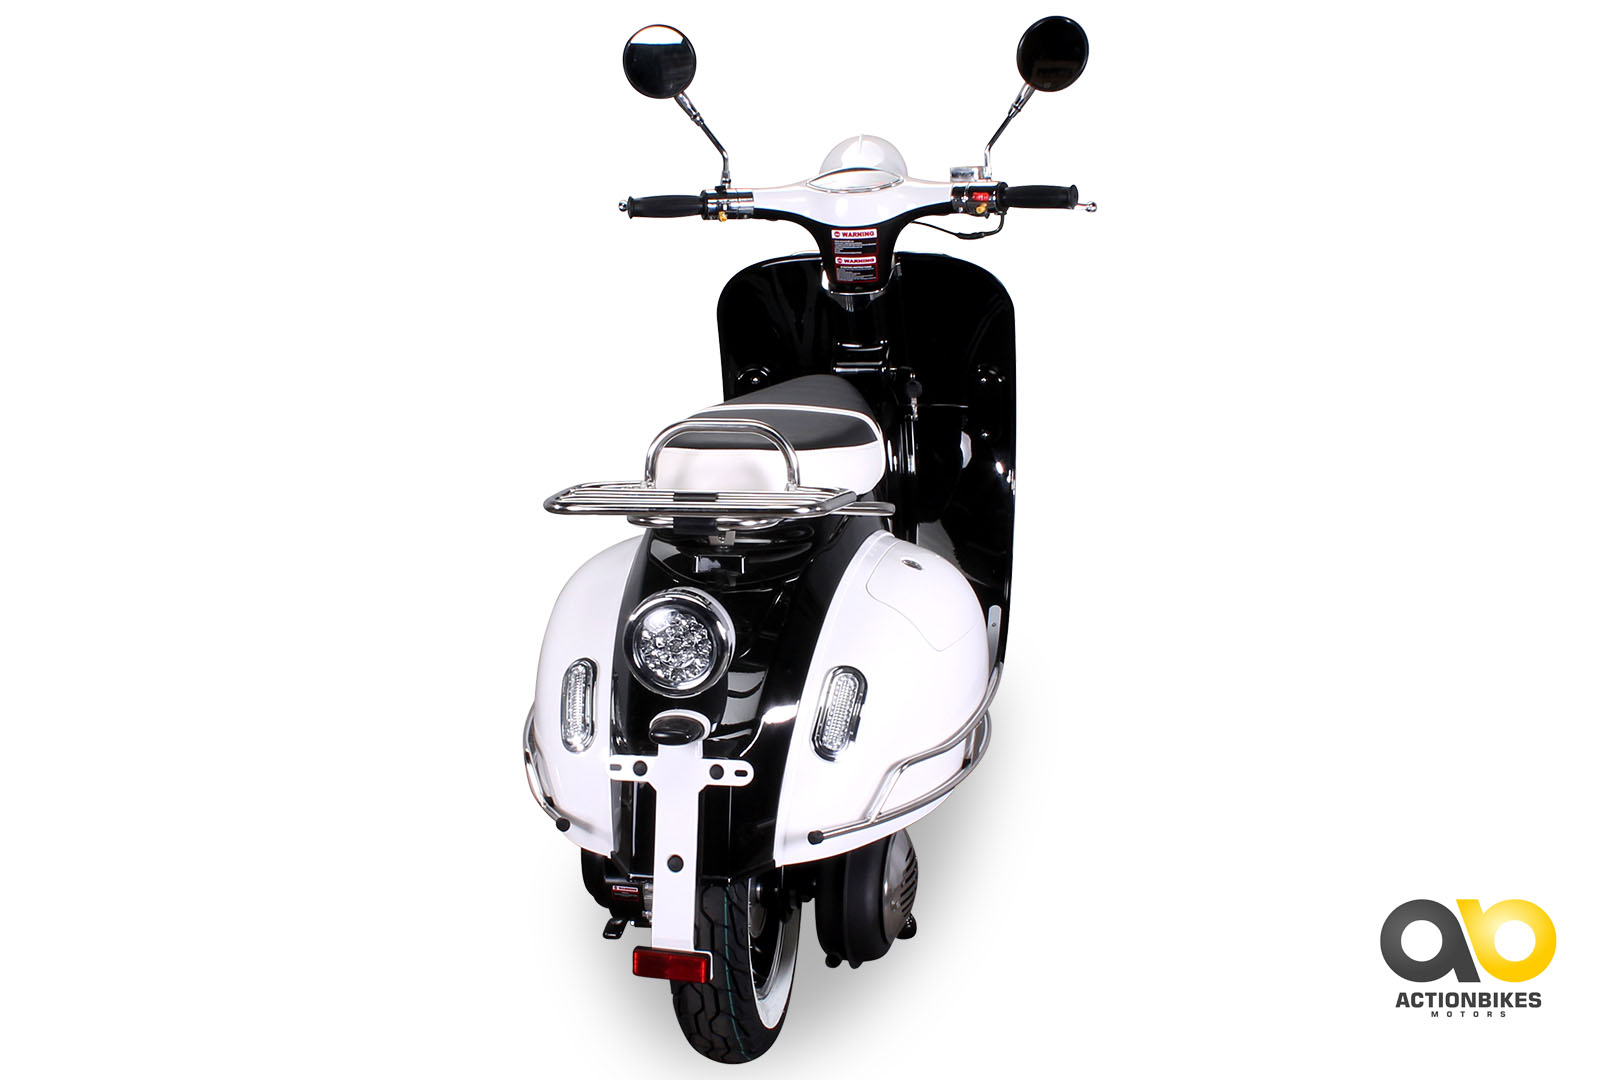 znen retro star roller 125 cc motorroller retroroller. Black Bedroom Furniture Sets. Home Design Ideas